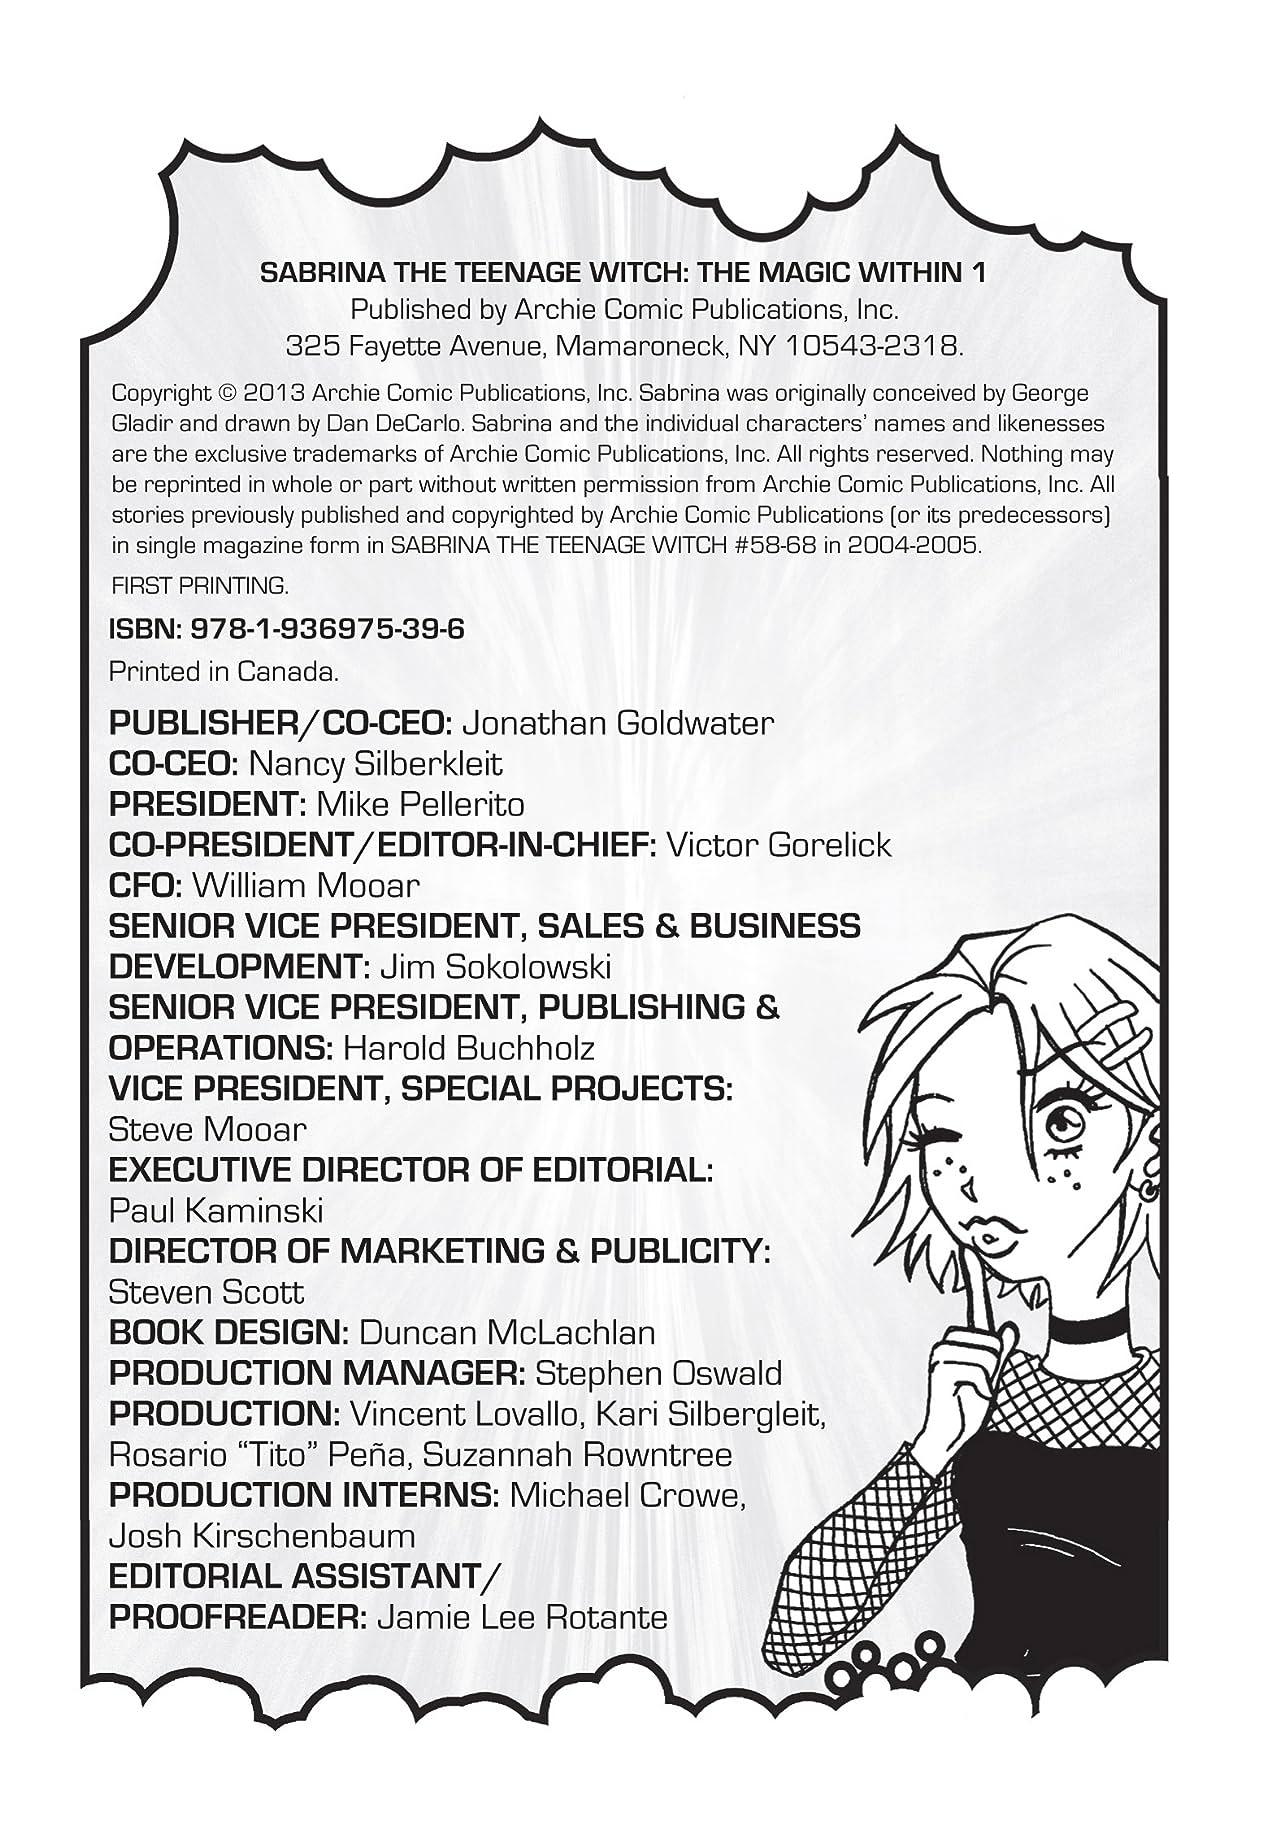 Sabrina Manga: The Magic Within Vol. 1